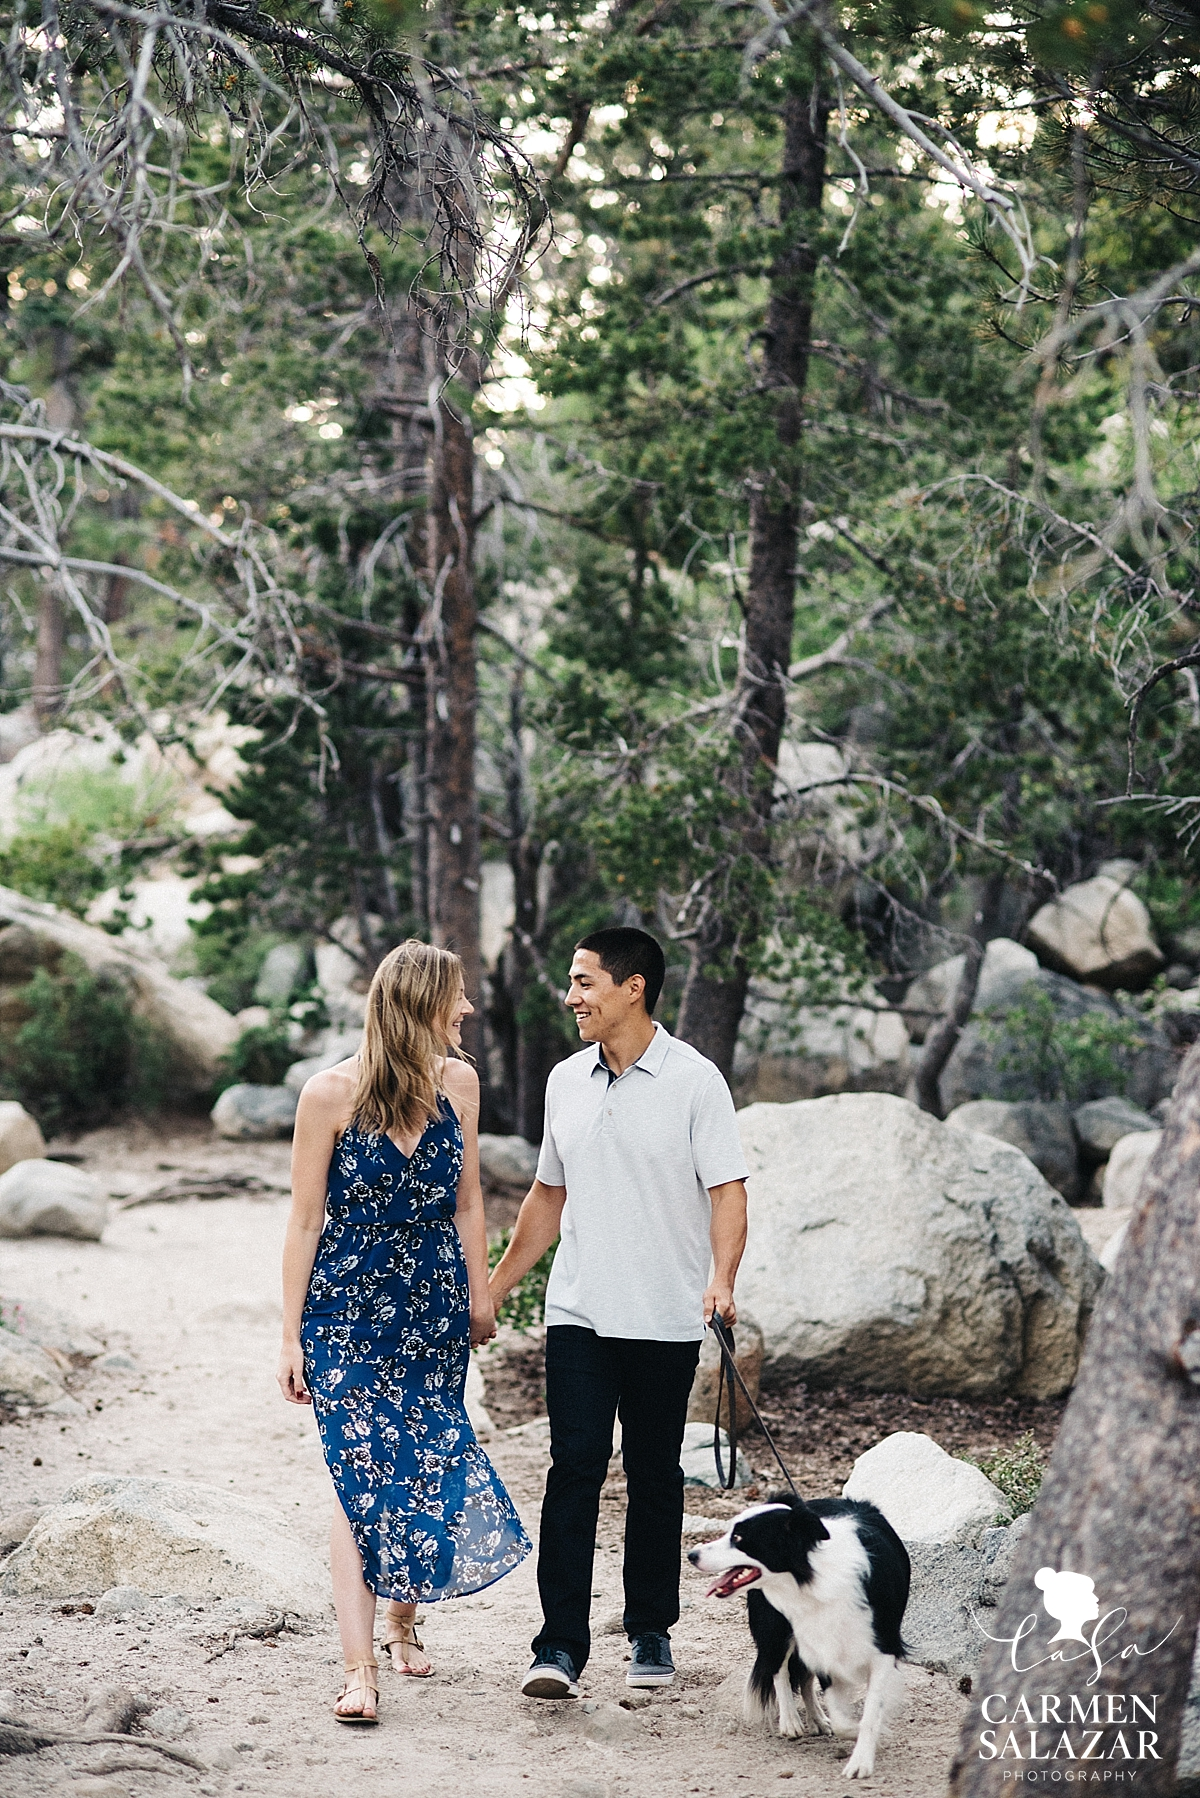 Adventurous Lake Tahoe couple with pet dog - Carmen Salazar